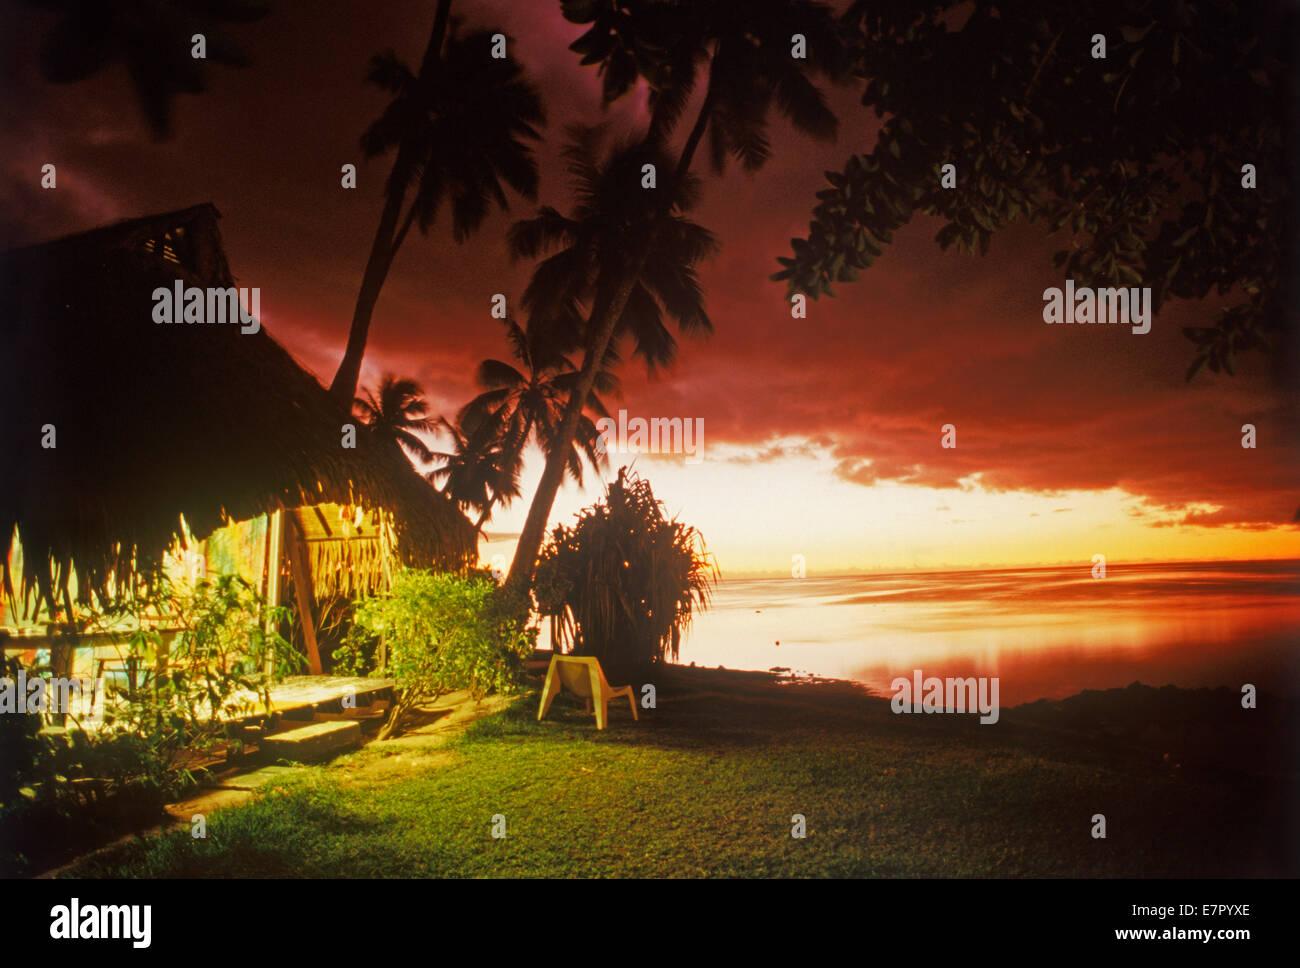 Hut illuminated at dusk on Moorea Island in French Polynesia - Stock Image